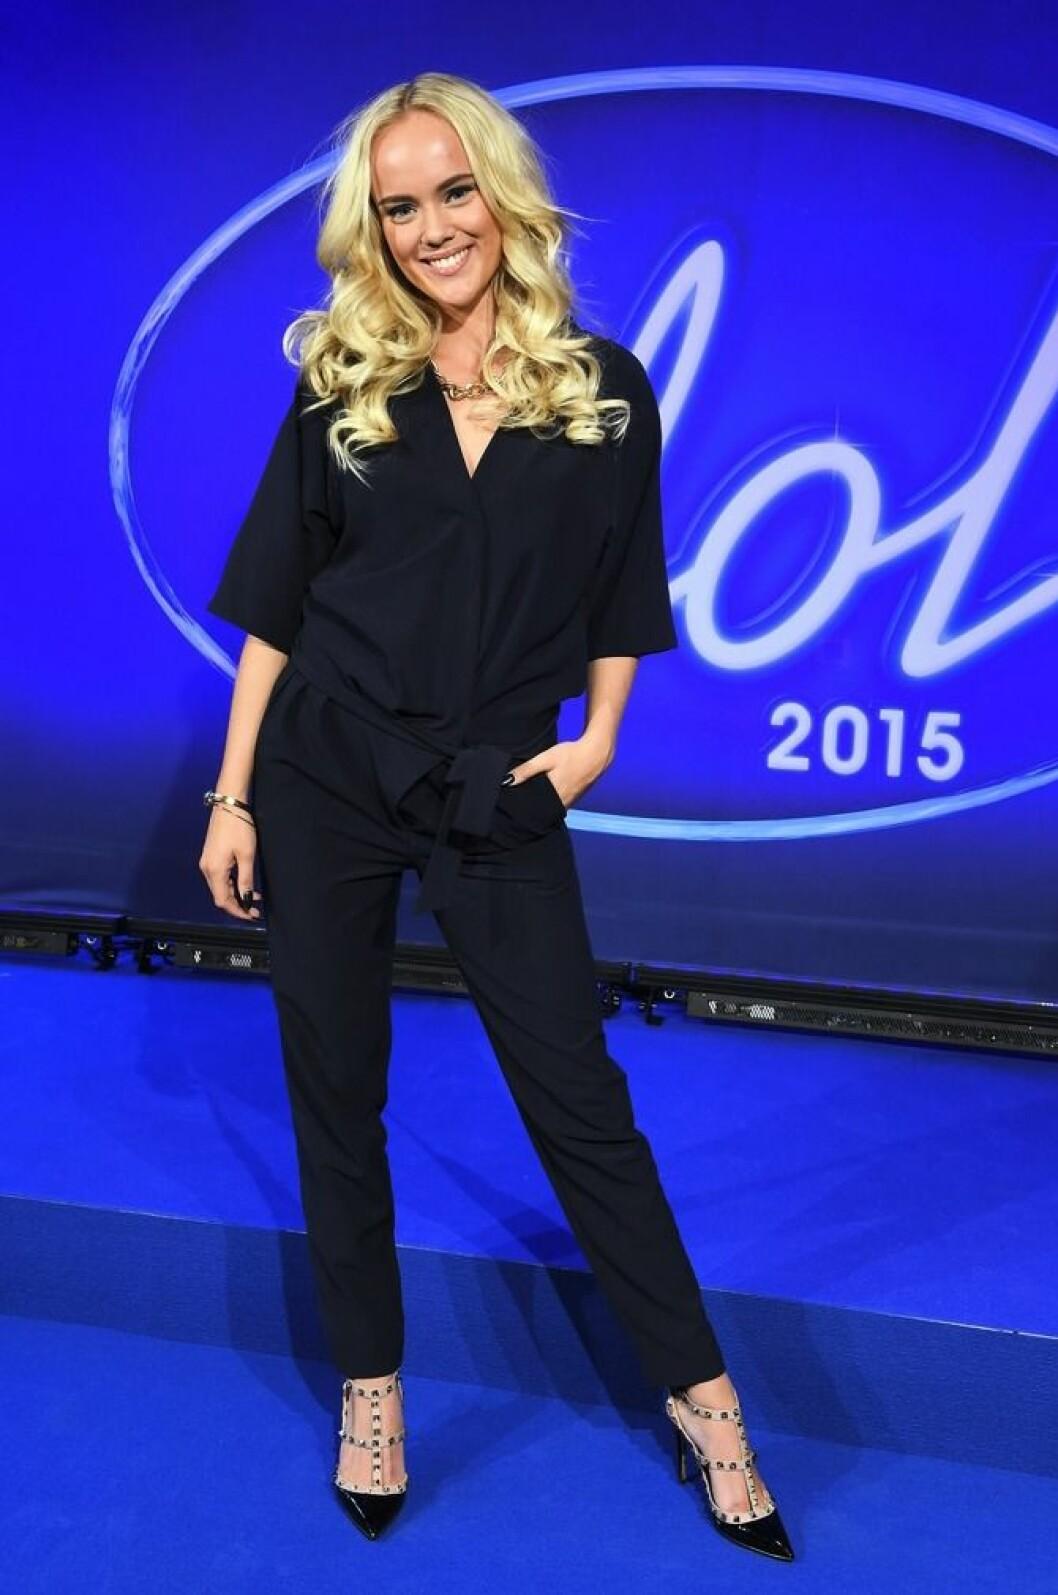 Amanda Winberg fotas inför Idol 2015.